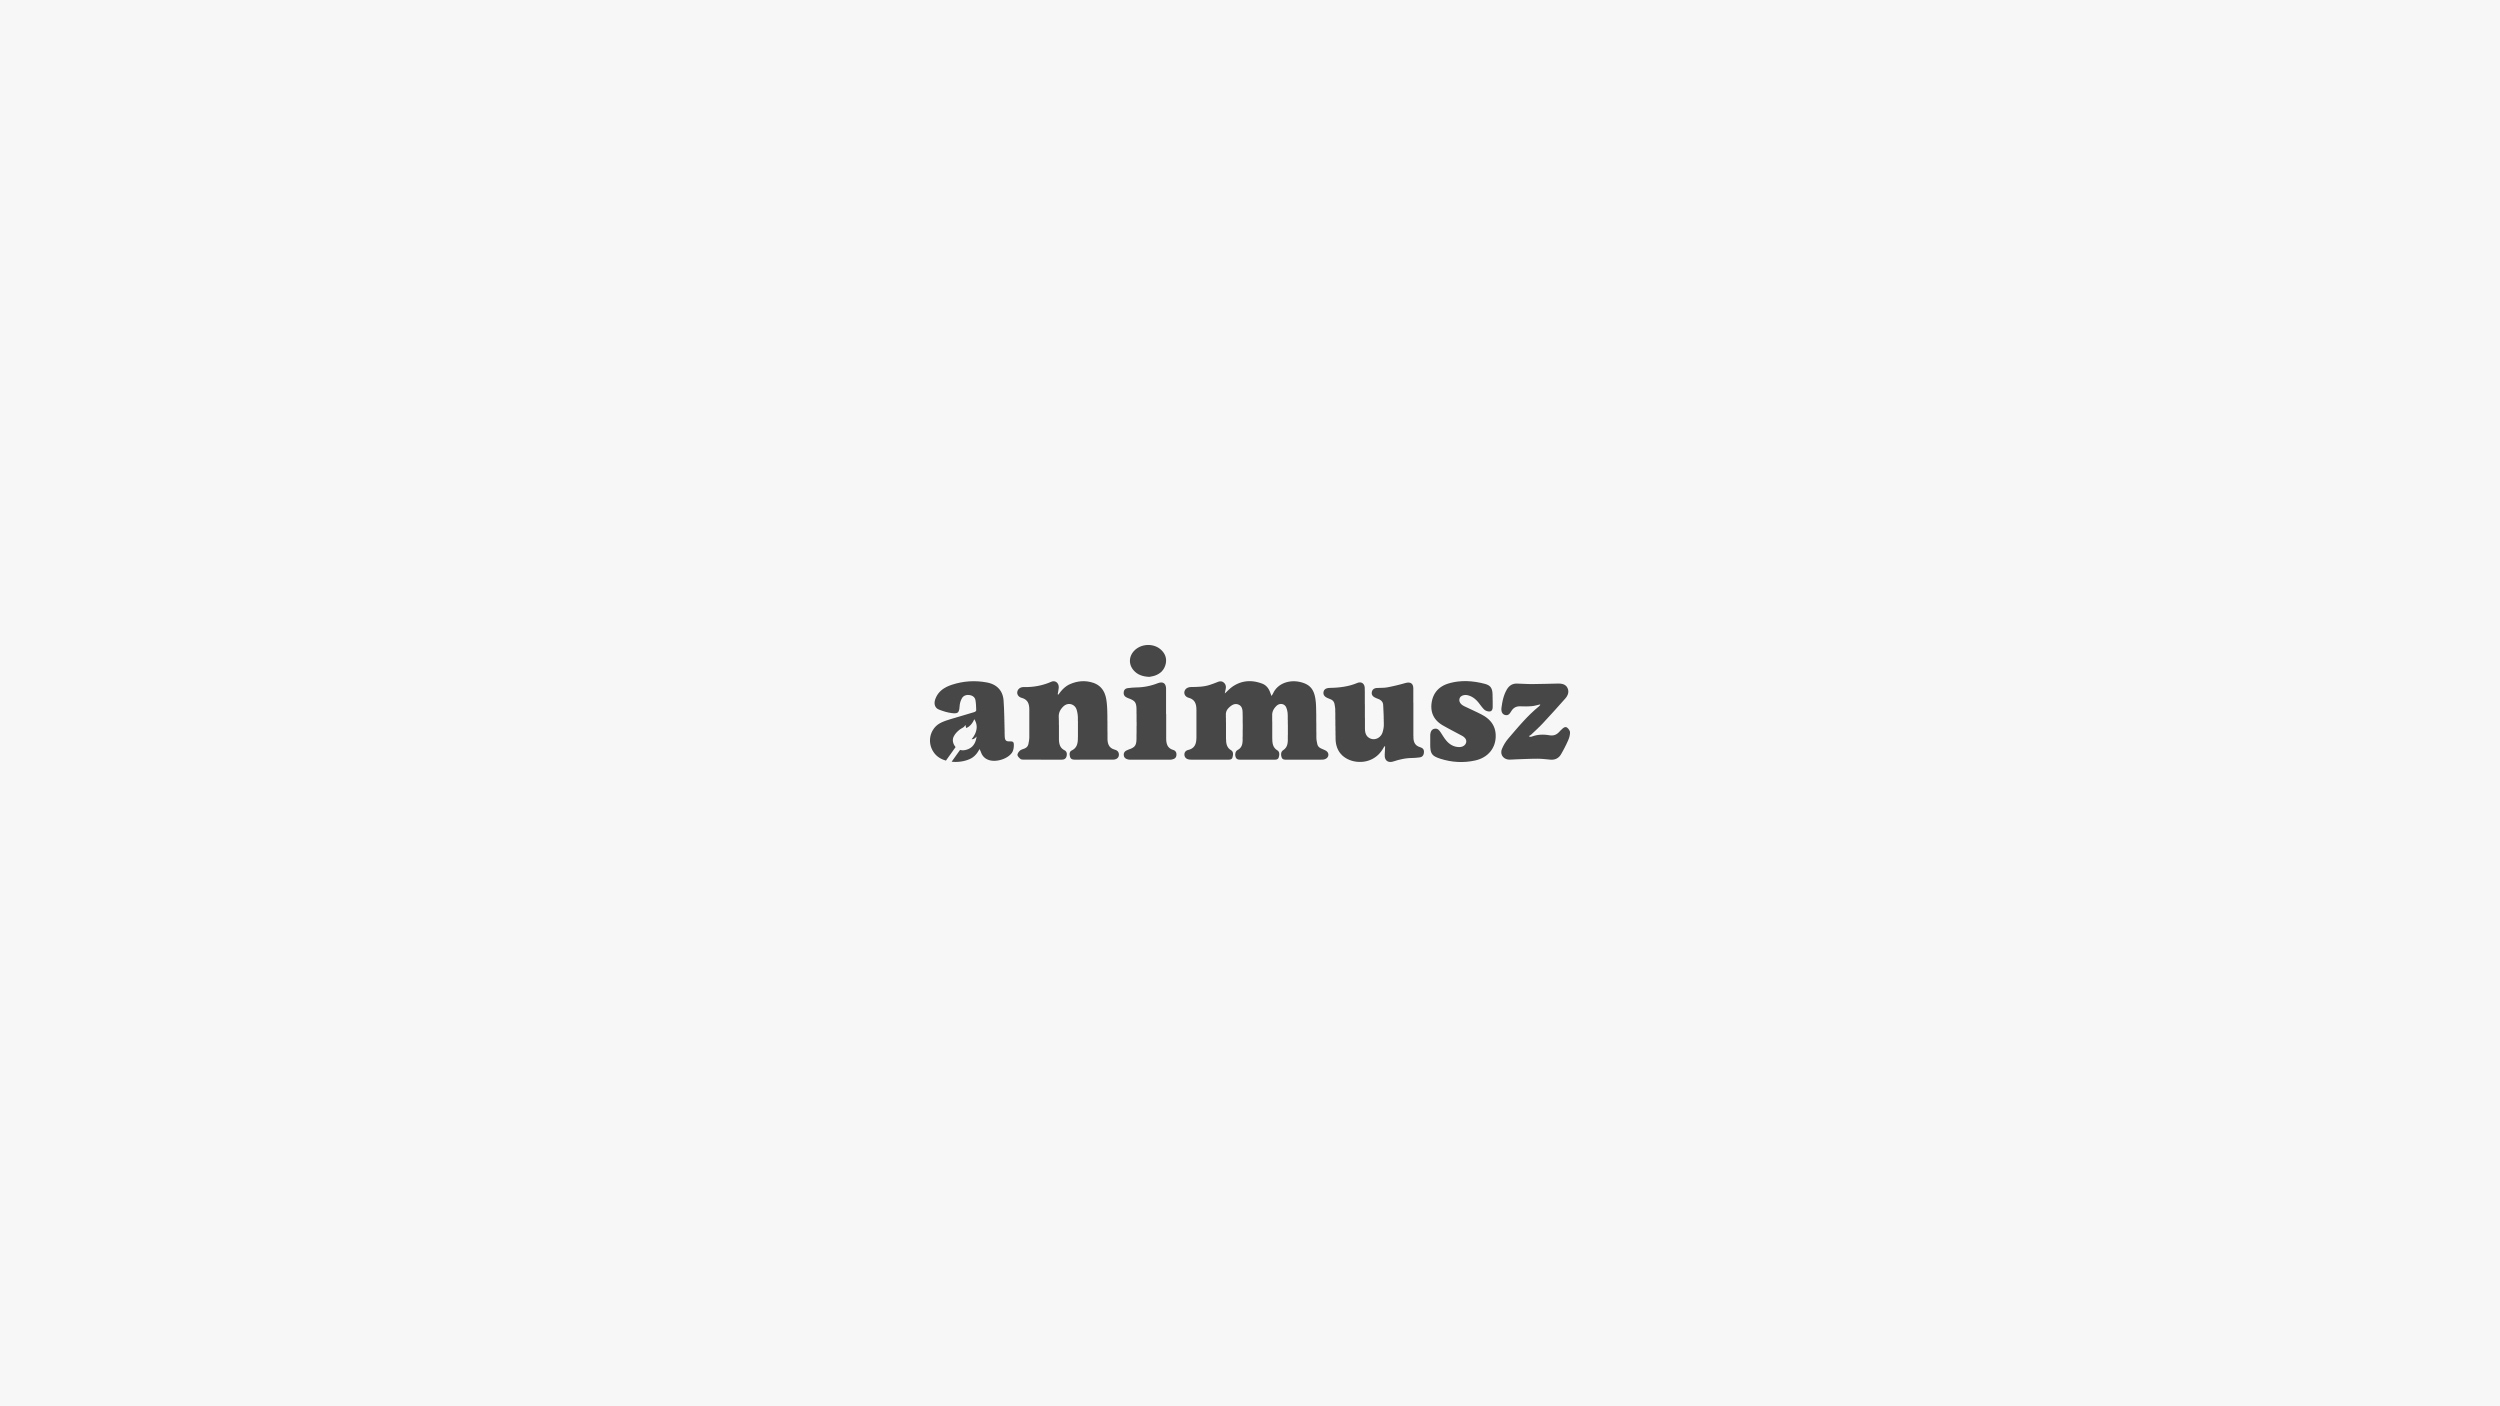 animusz_4